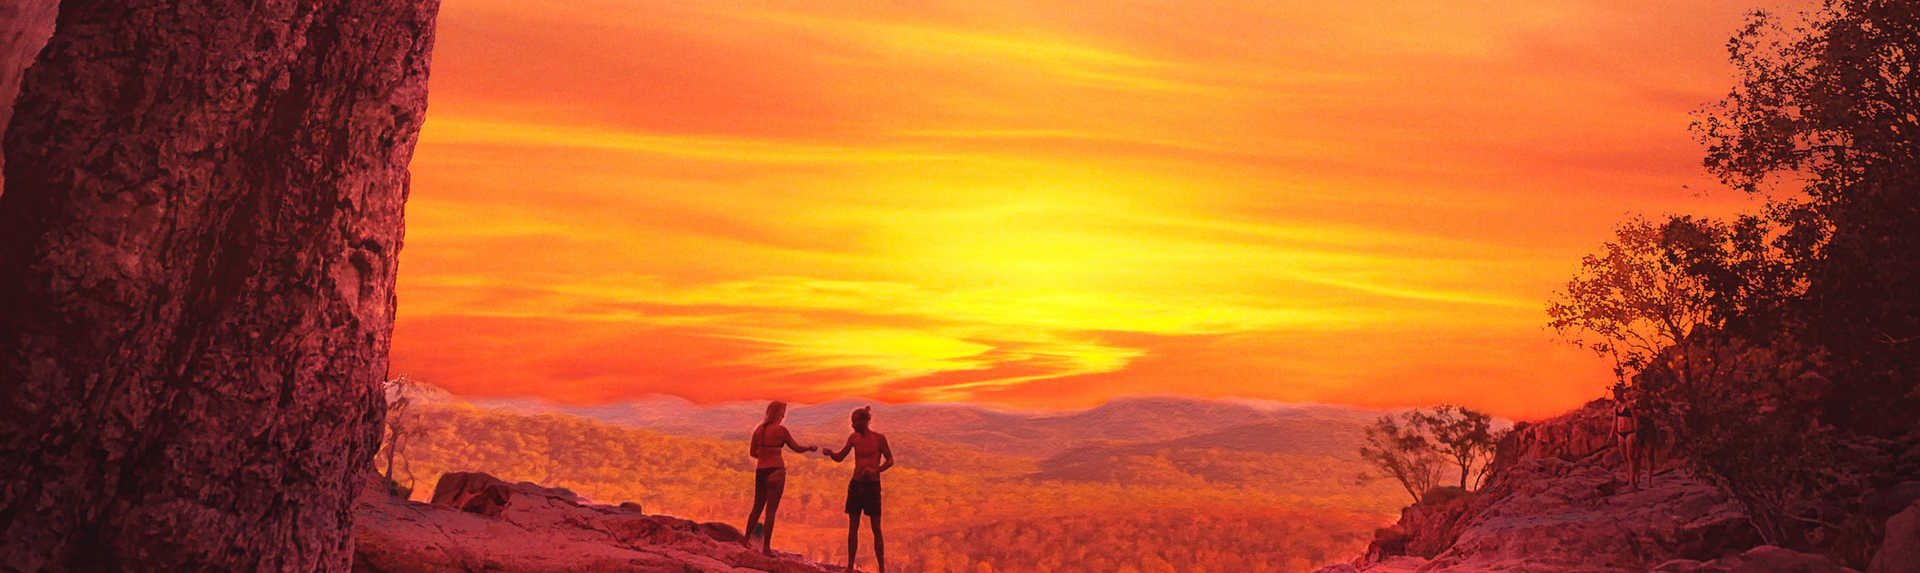 How Many Hours Drive is it from Darwin to Kakadu?